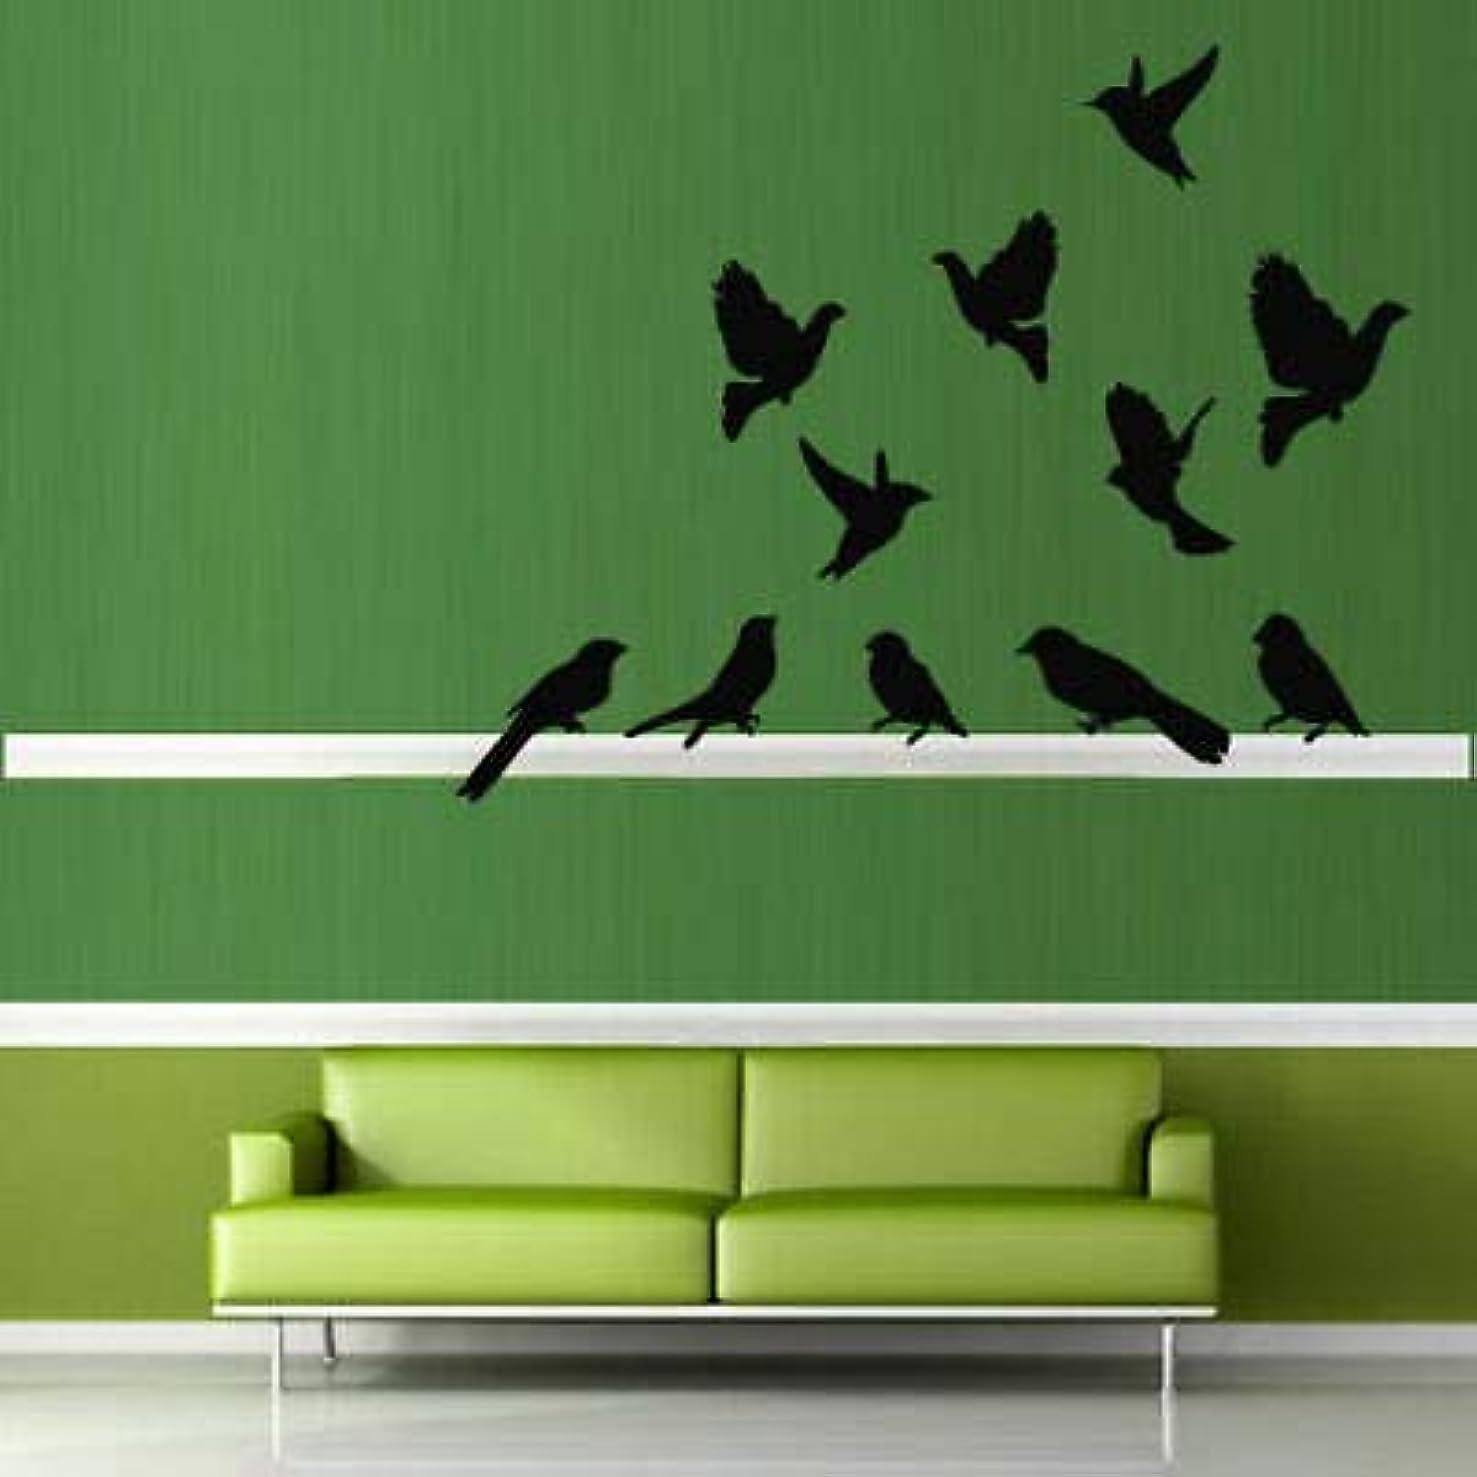 Yilooom Wall Decal Sticker Vinyl Bird Flight Wings Pack Bedroom Room Nursery